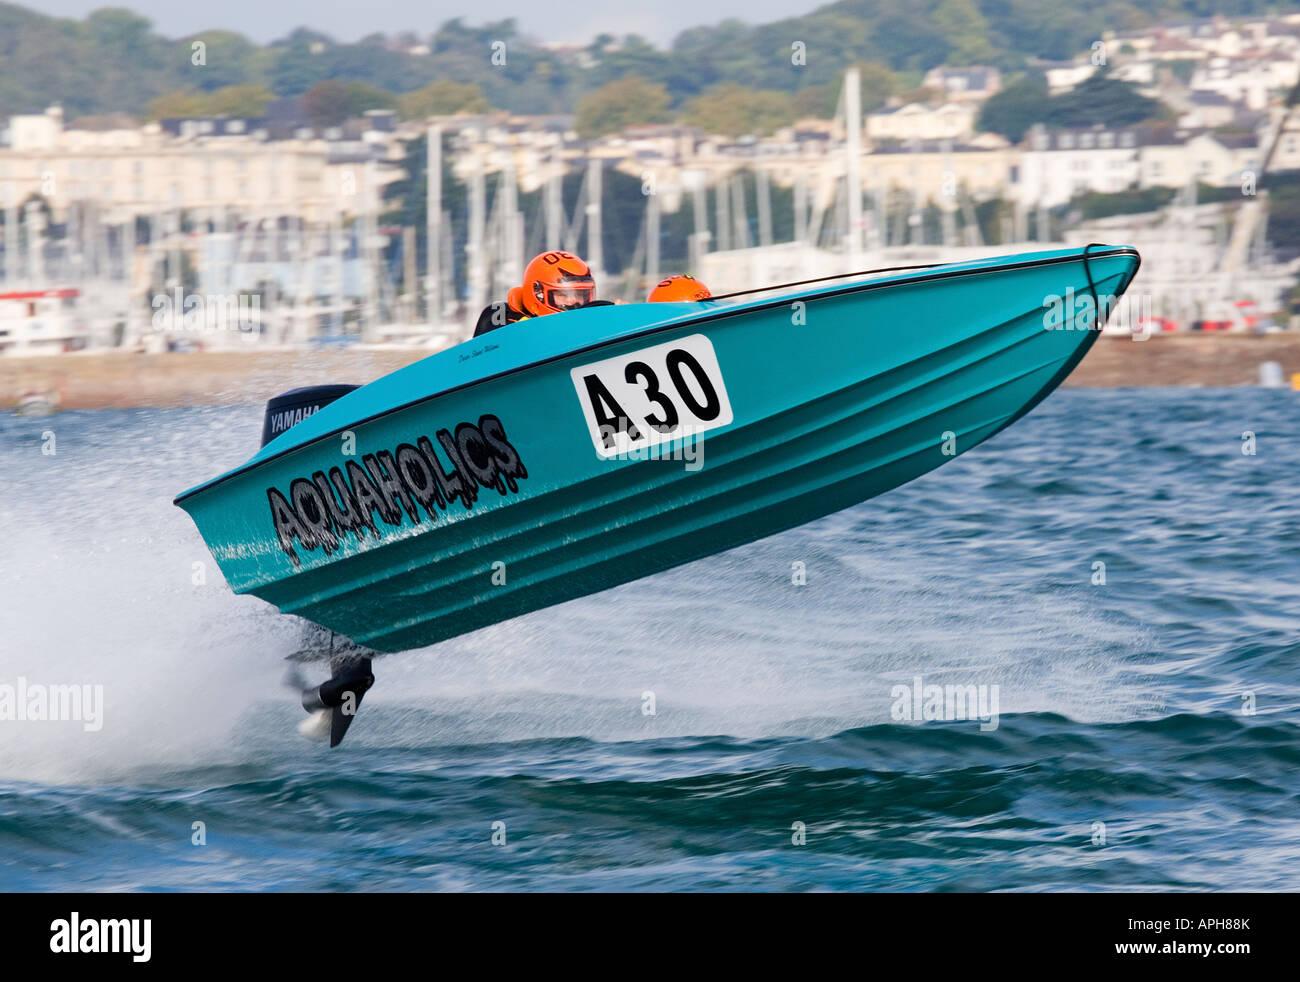 Offshore Circuit Racing Aquaholics No. A30 Racing at Torquay England - Stock Image